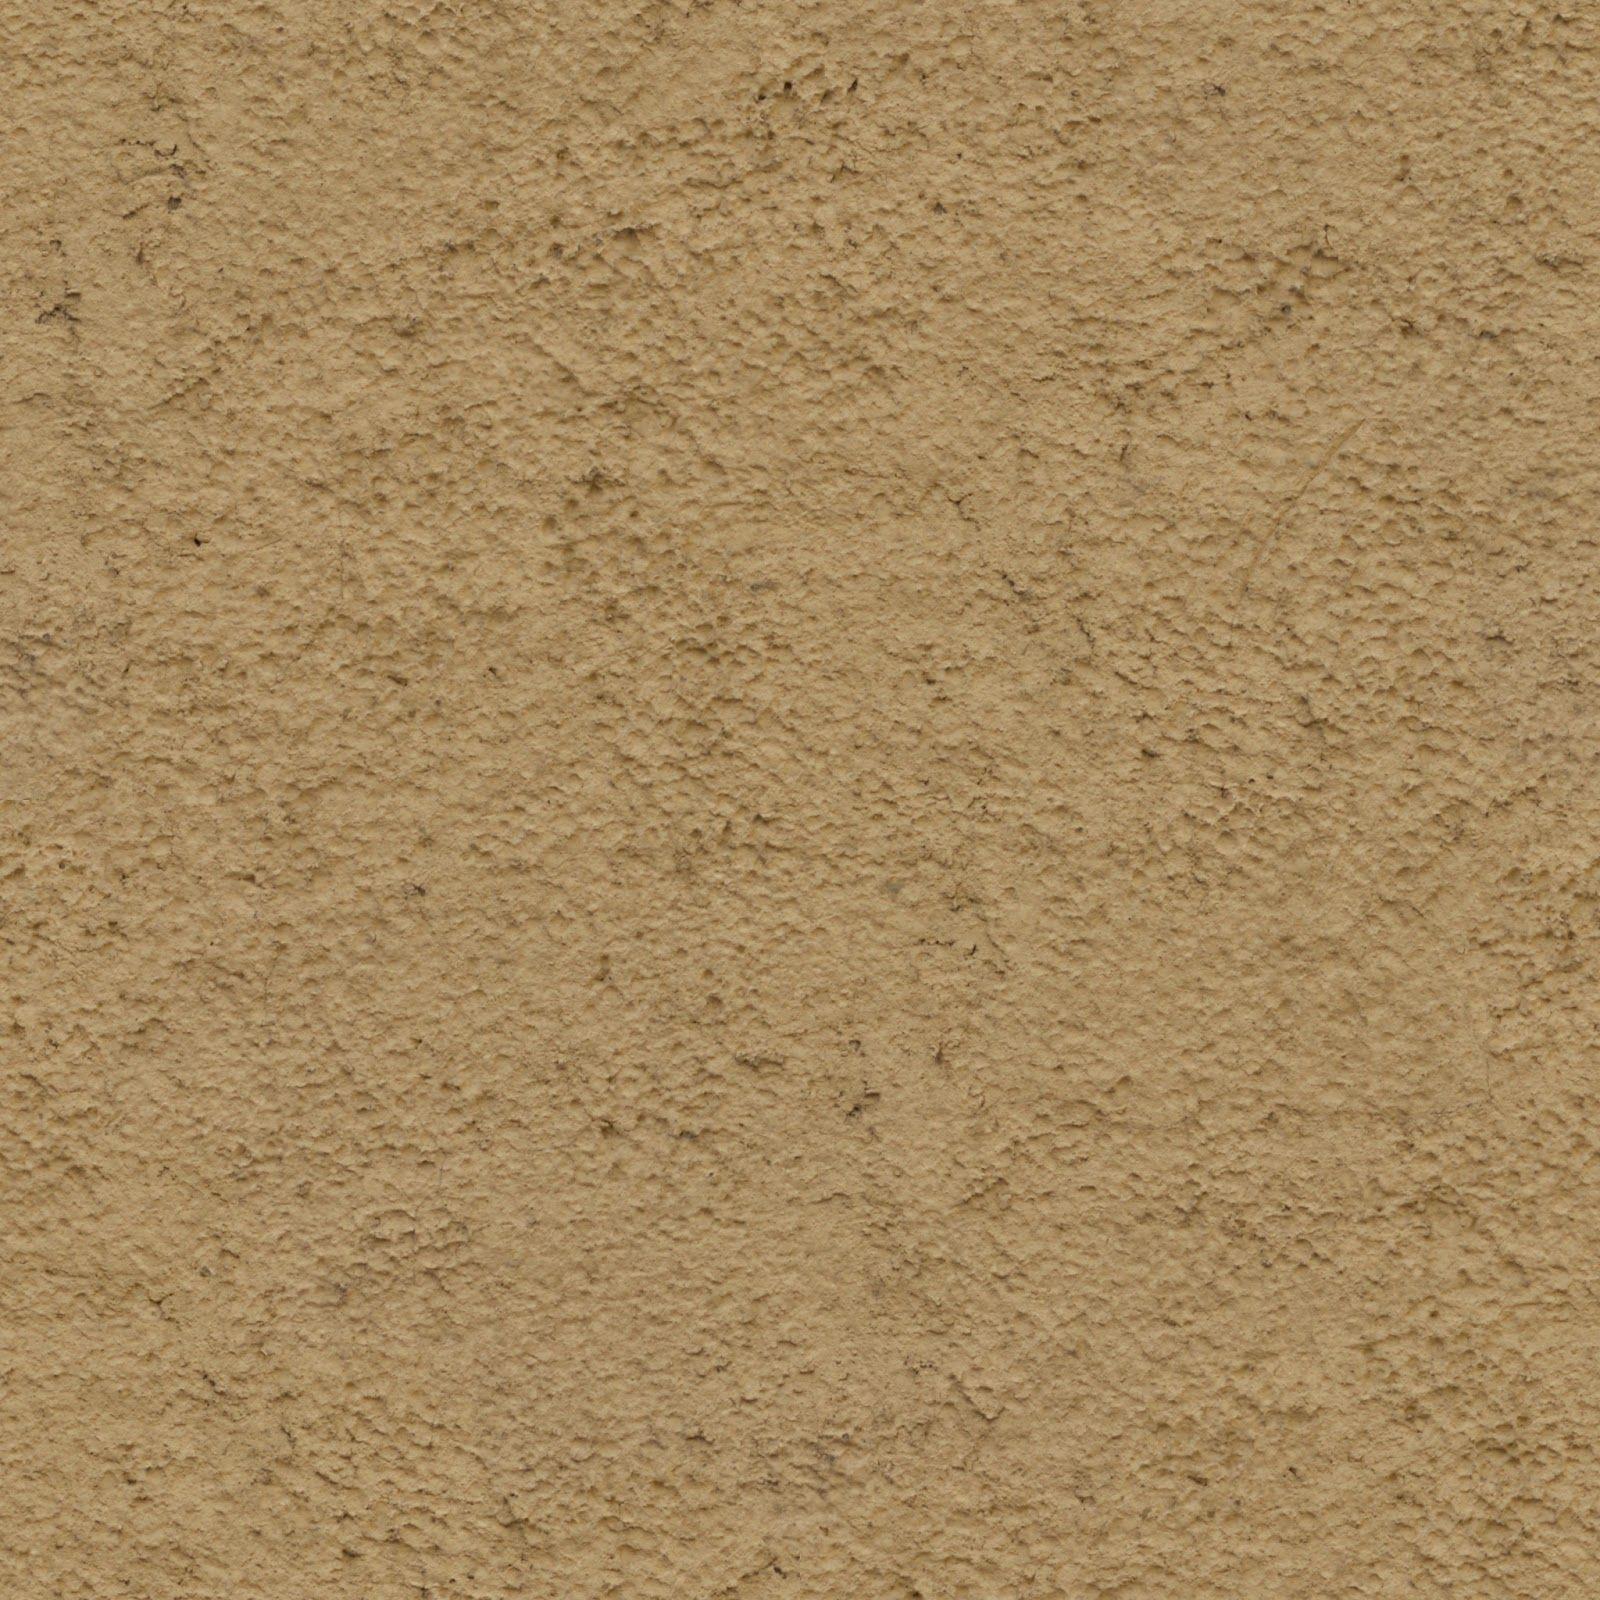 Stucco Dirty Rough Stucco Plaster Wall Paper Seamless Texture 7 Refs Textures Pinterest